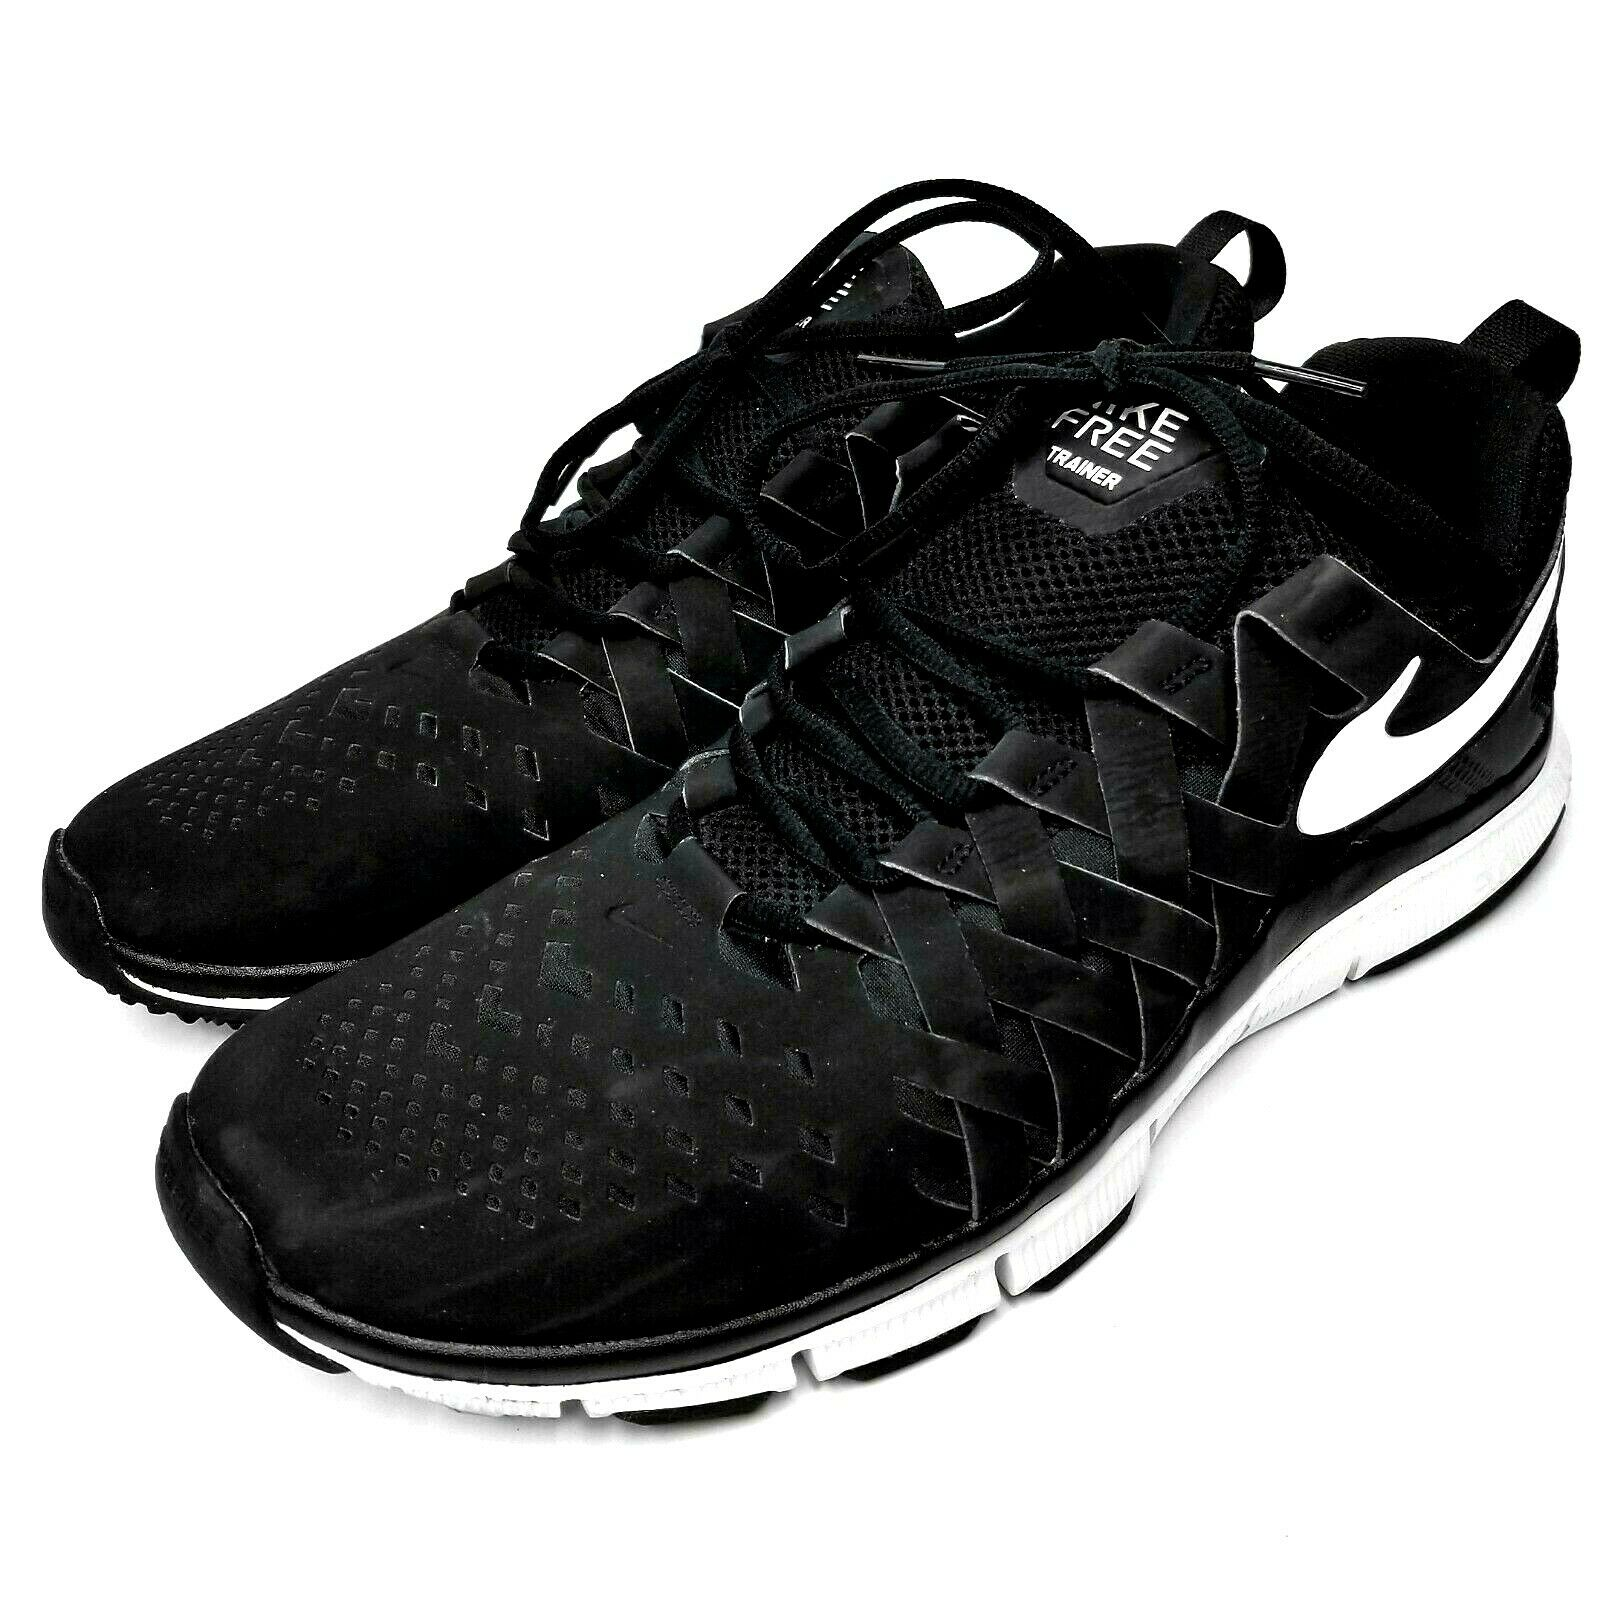 Nike Mens Free Trainer 5.0 Athletic Running shoes Black Black Black White 579809-010 Size 14 4f3e9d